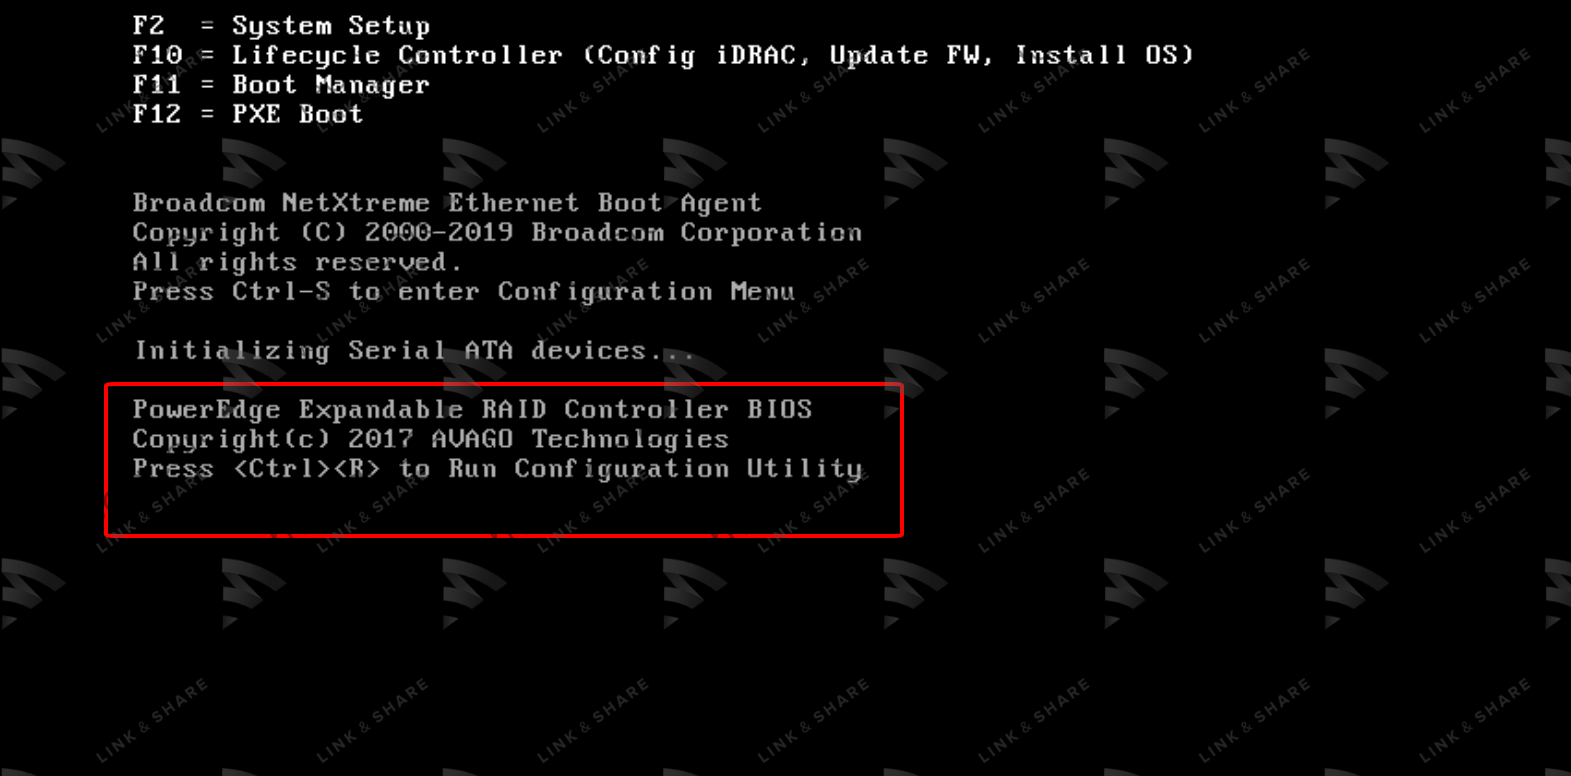 3 1 - Flash/Crossflash Card Raid DELL H330 Sang HBA330/12Gbps HBA IT Firmware